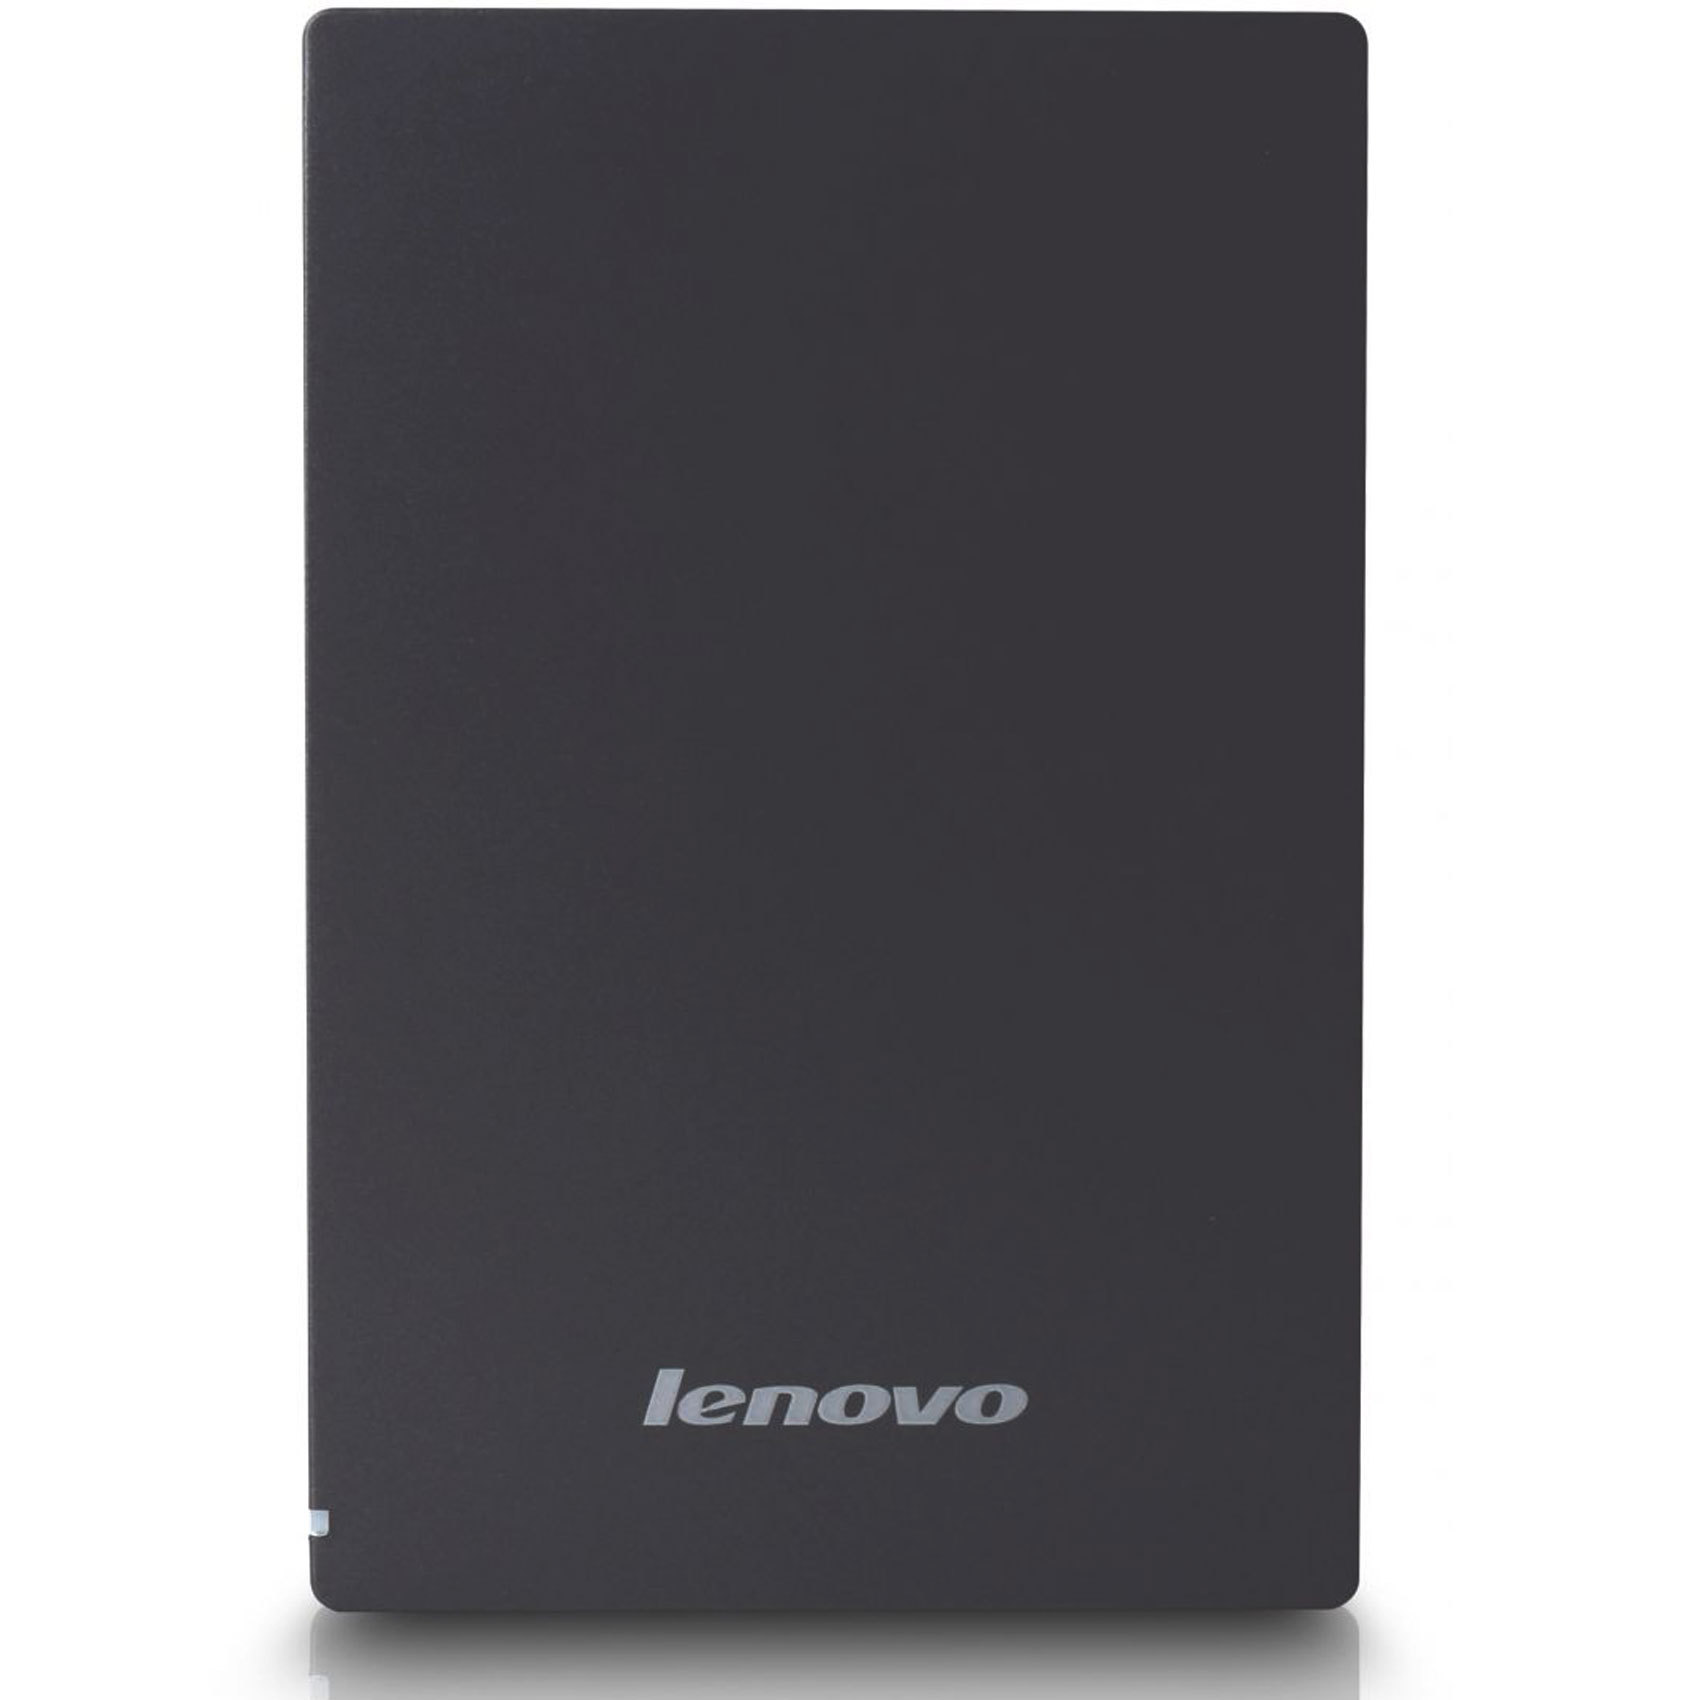 LENOVO HDD 1TB USB 3